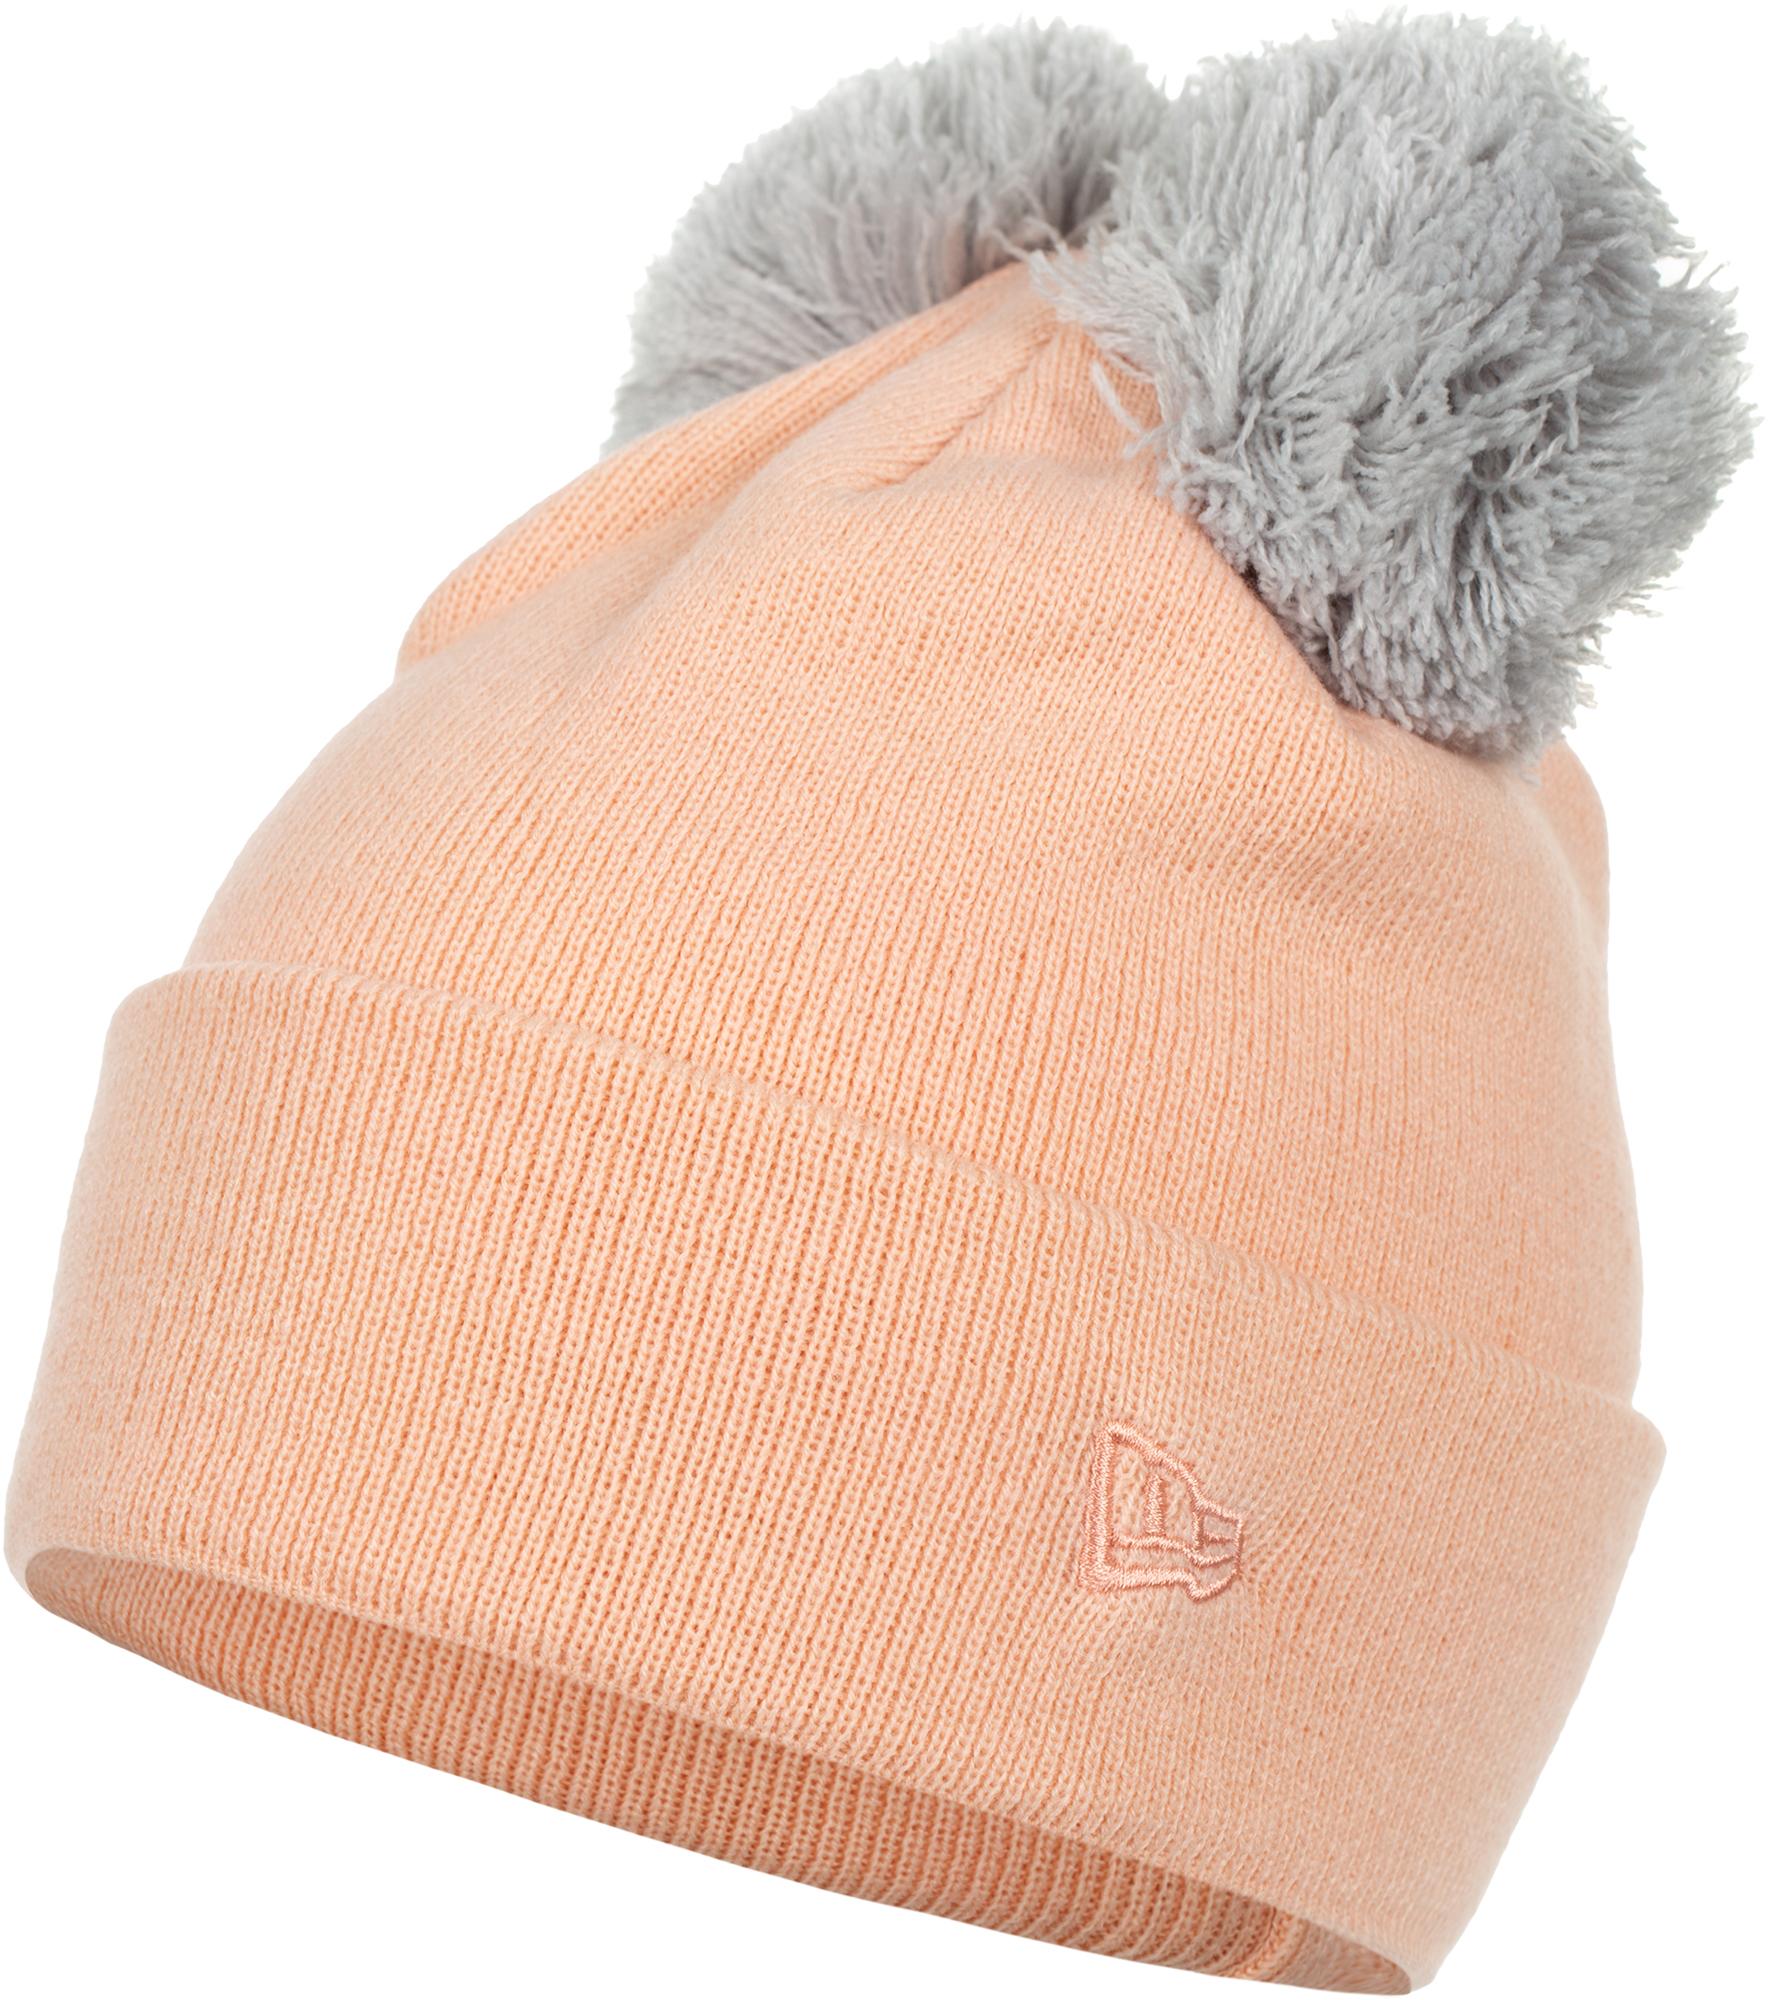 New Era Шапка женская New Era Double Pom Cuff Knit new era шапка для мальчиков new era ne cuff pom размер 54 55